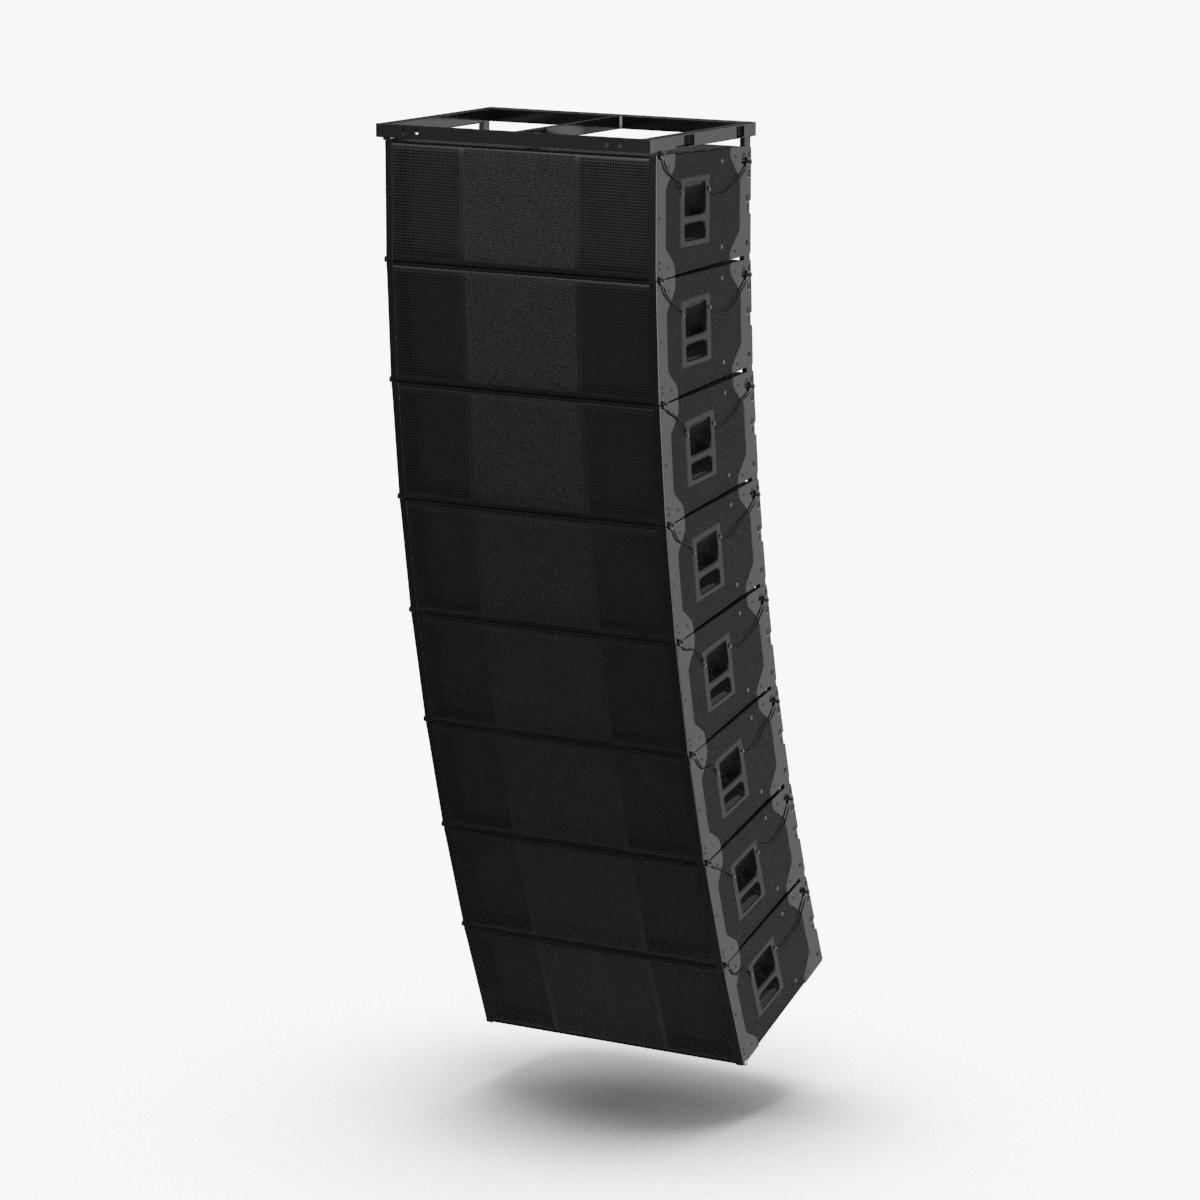 Stage Speaker 03 3d Model Ad Speaker Stage Model Speaker Computer Music 3d Model